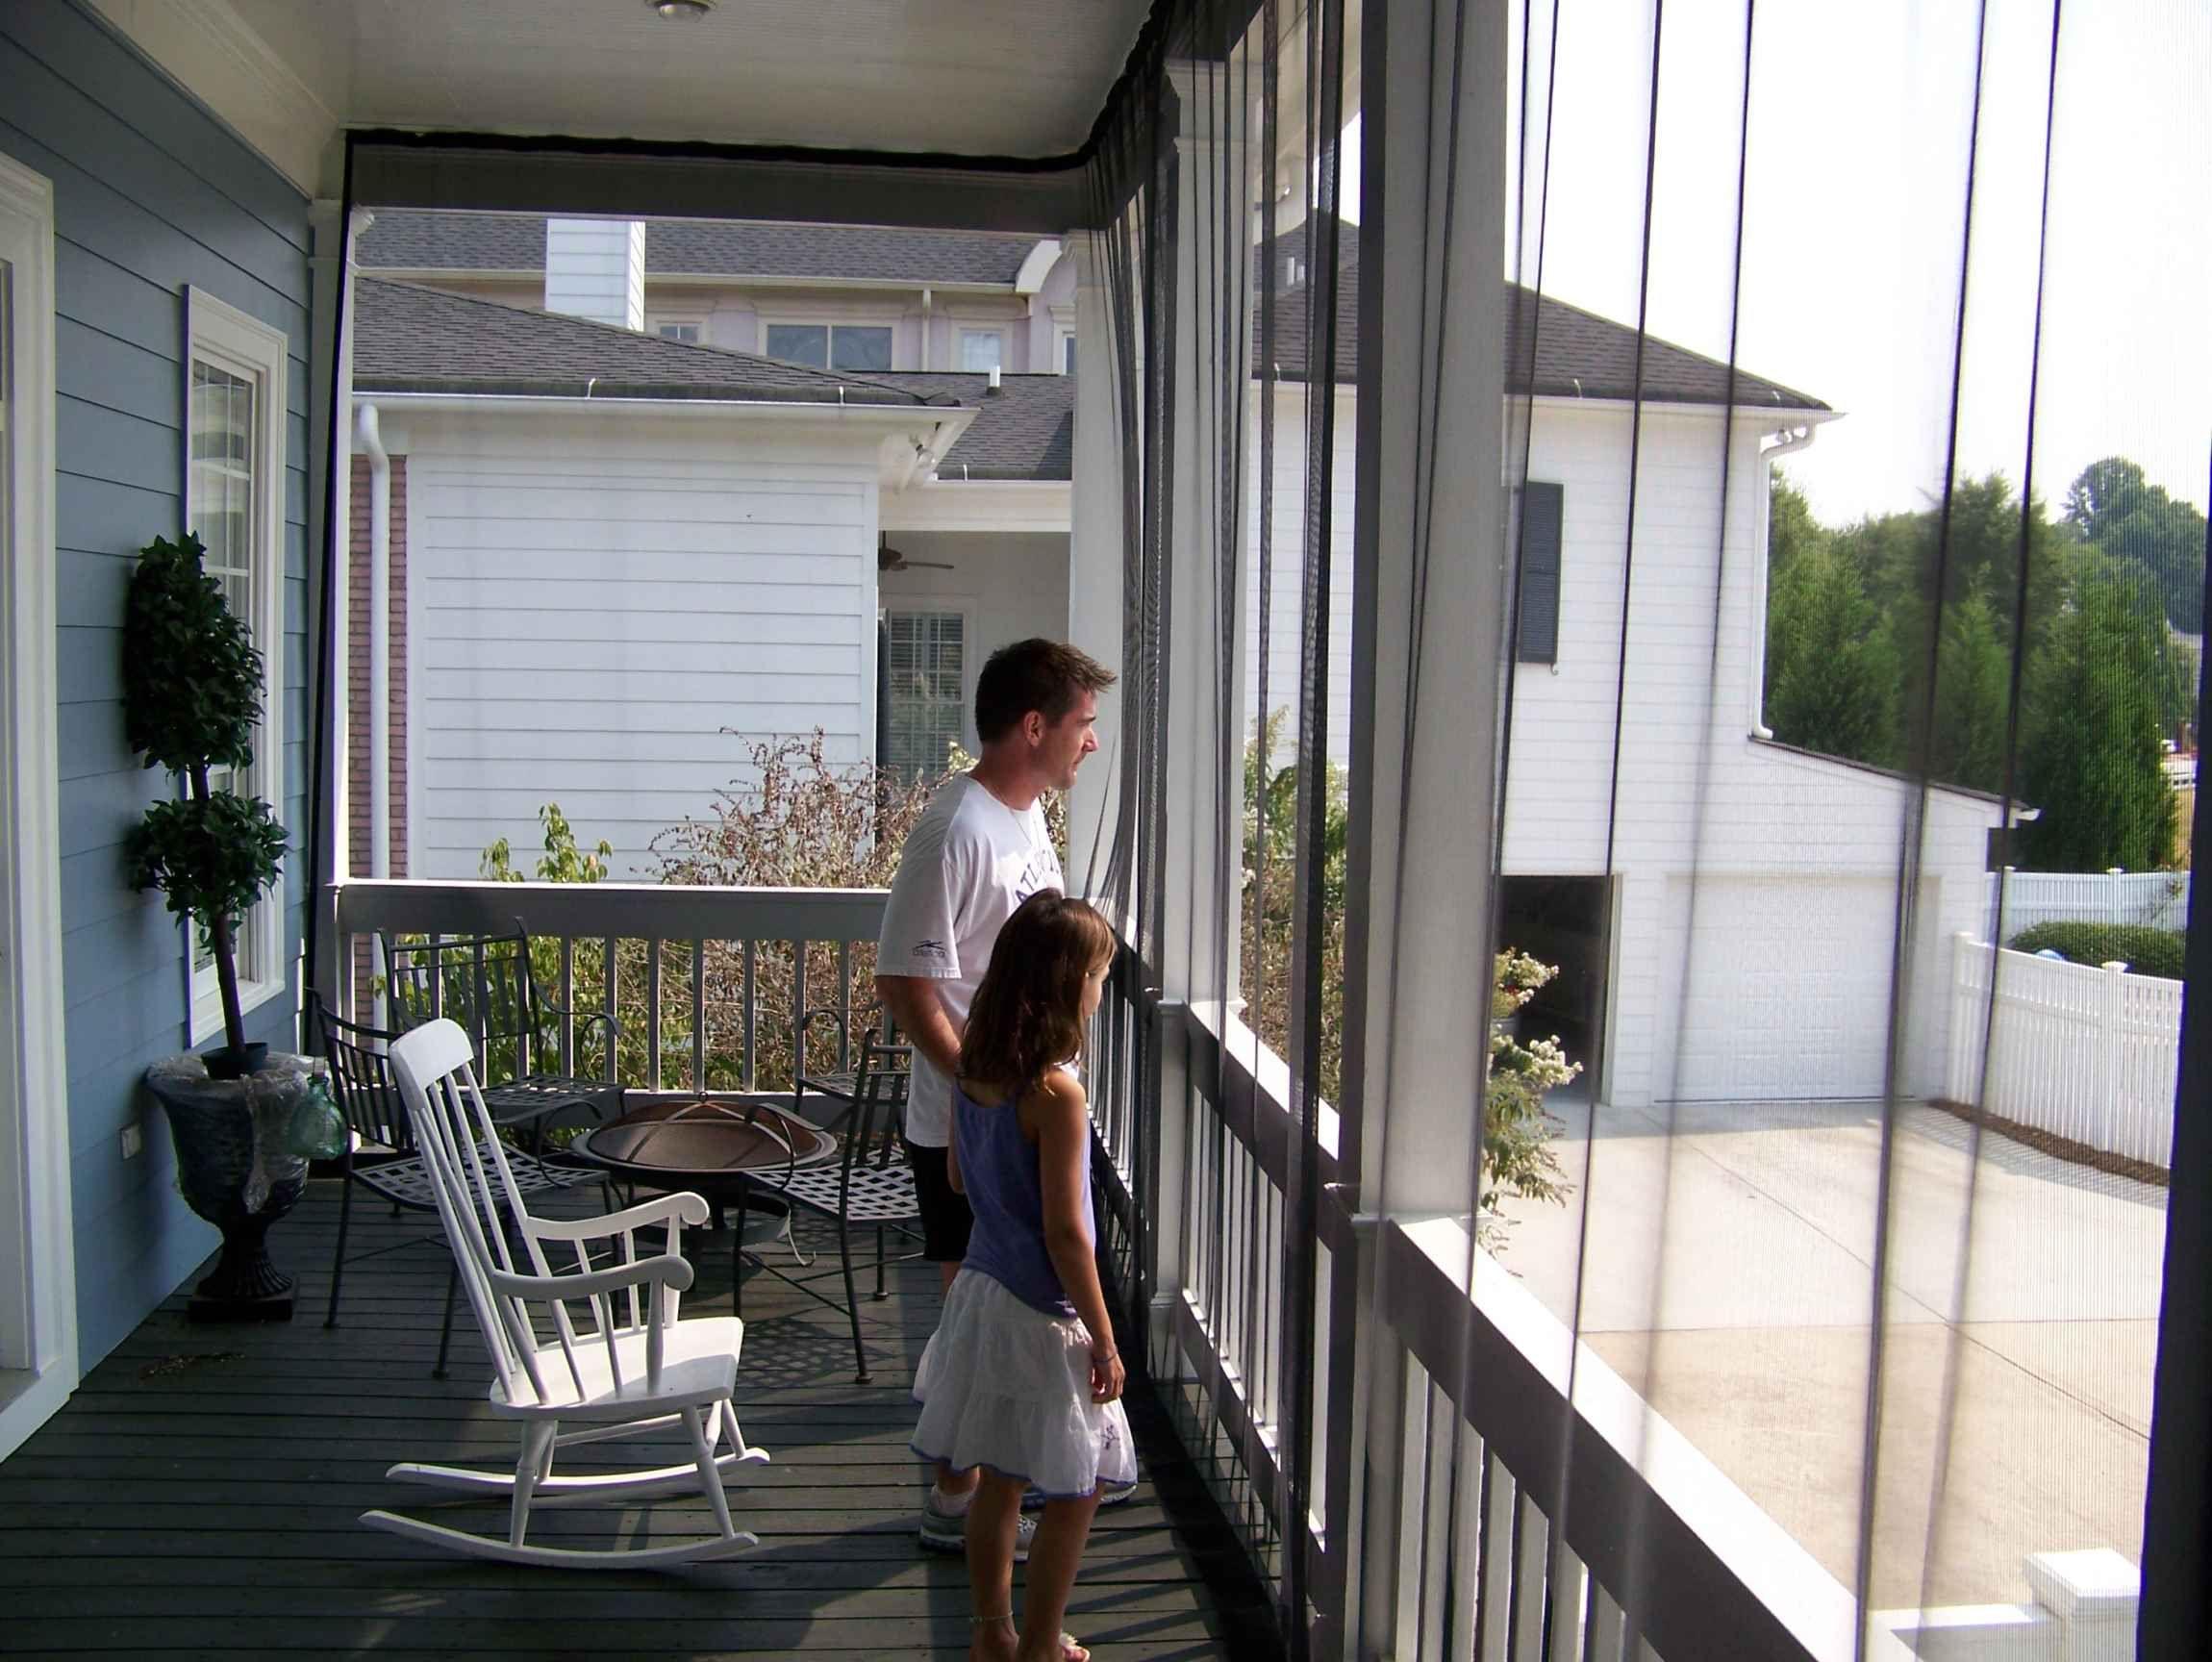 Black Anti Mosquito Pest Window Mesh Screen Curtain Protector